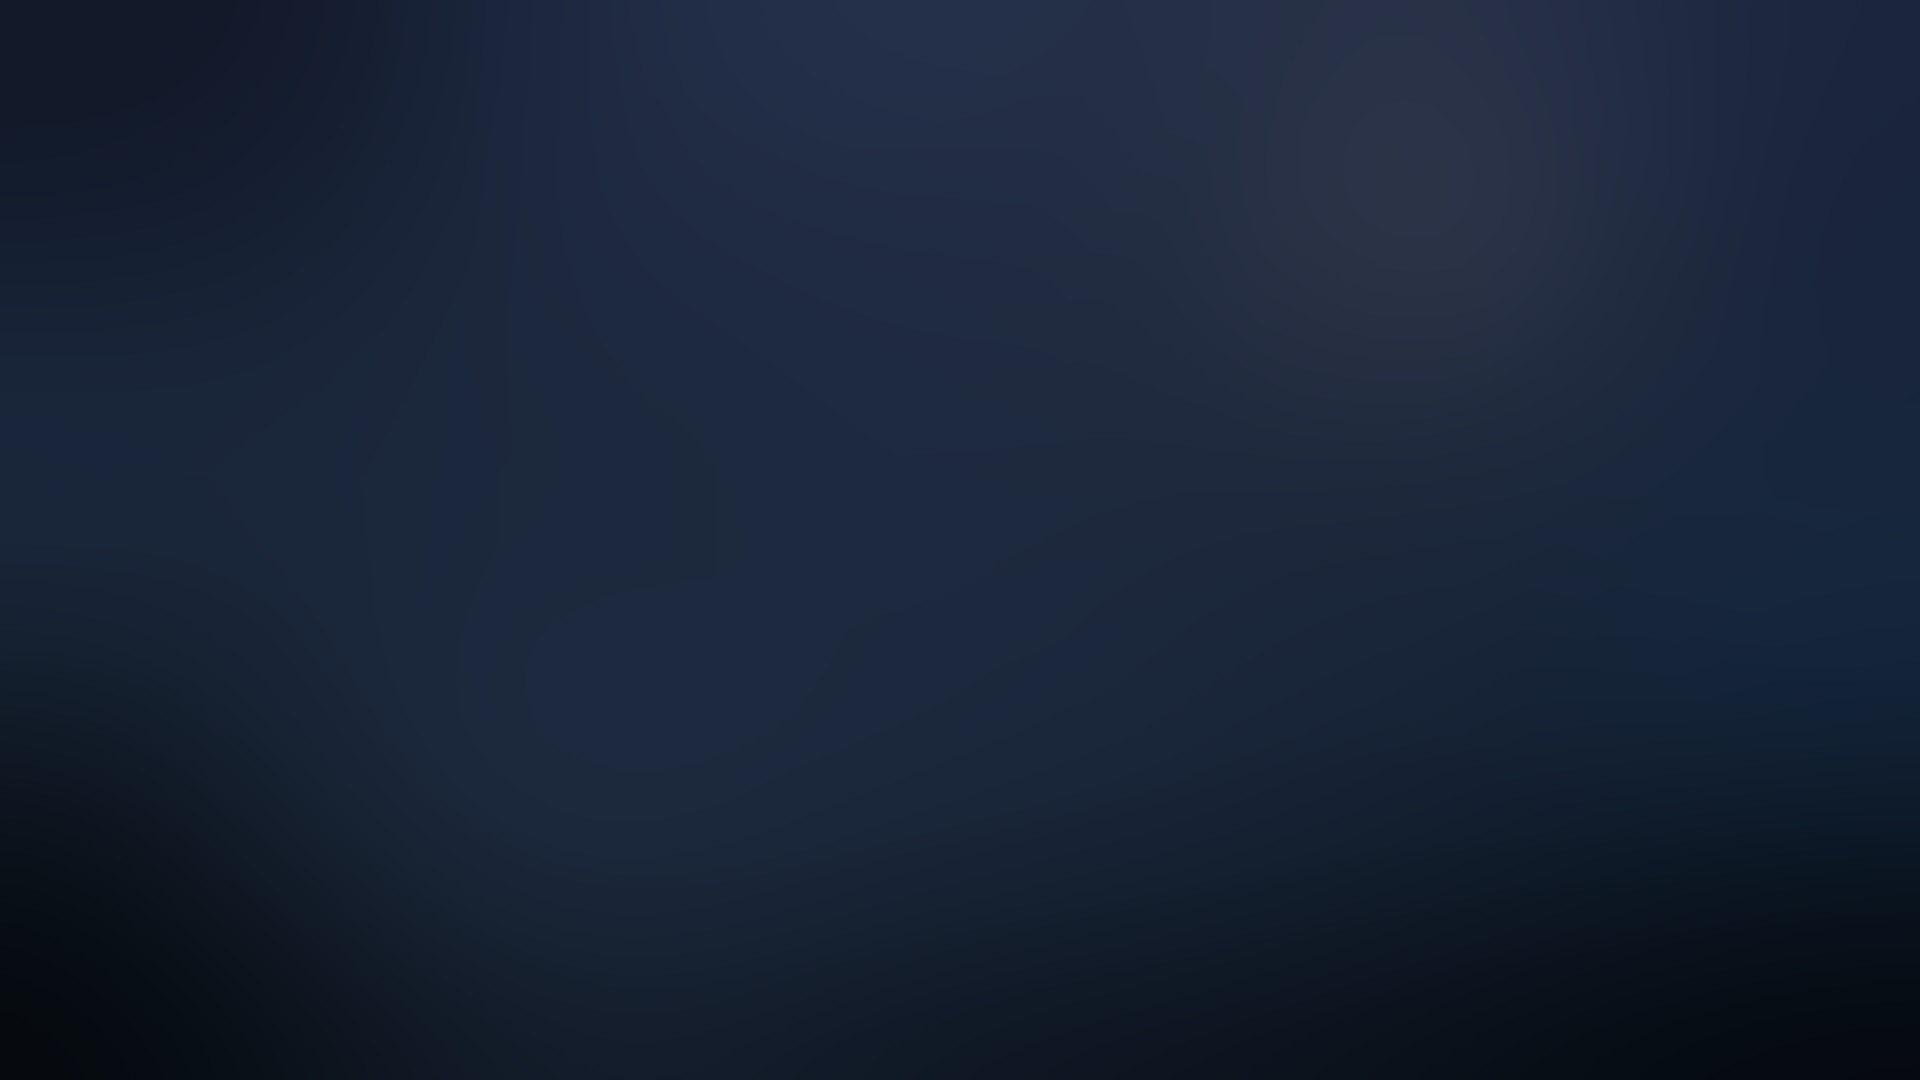 Res: 1920x1080, dark-blue-gradient-wallpaper-396-445-hd-wallpapers